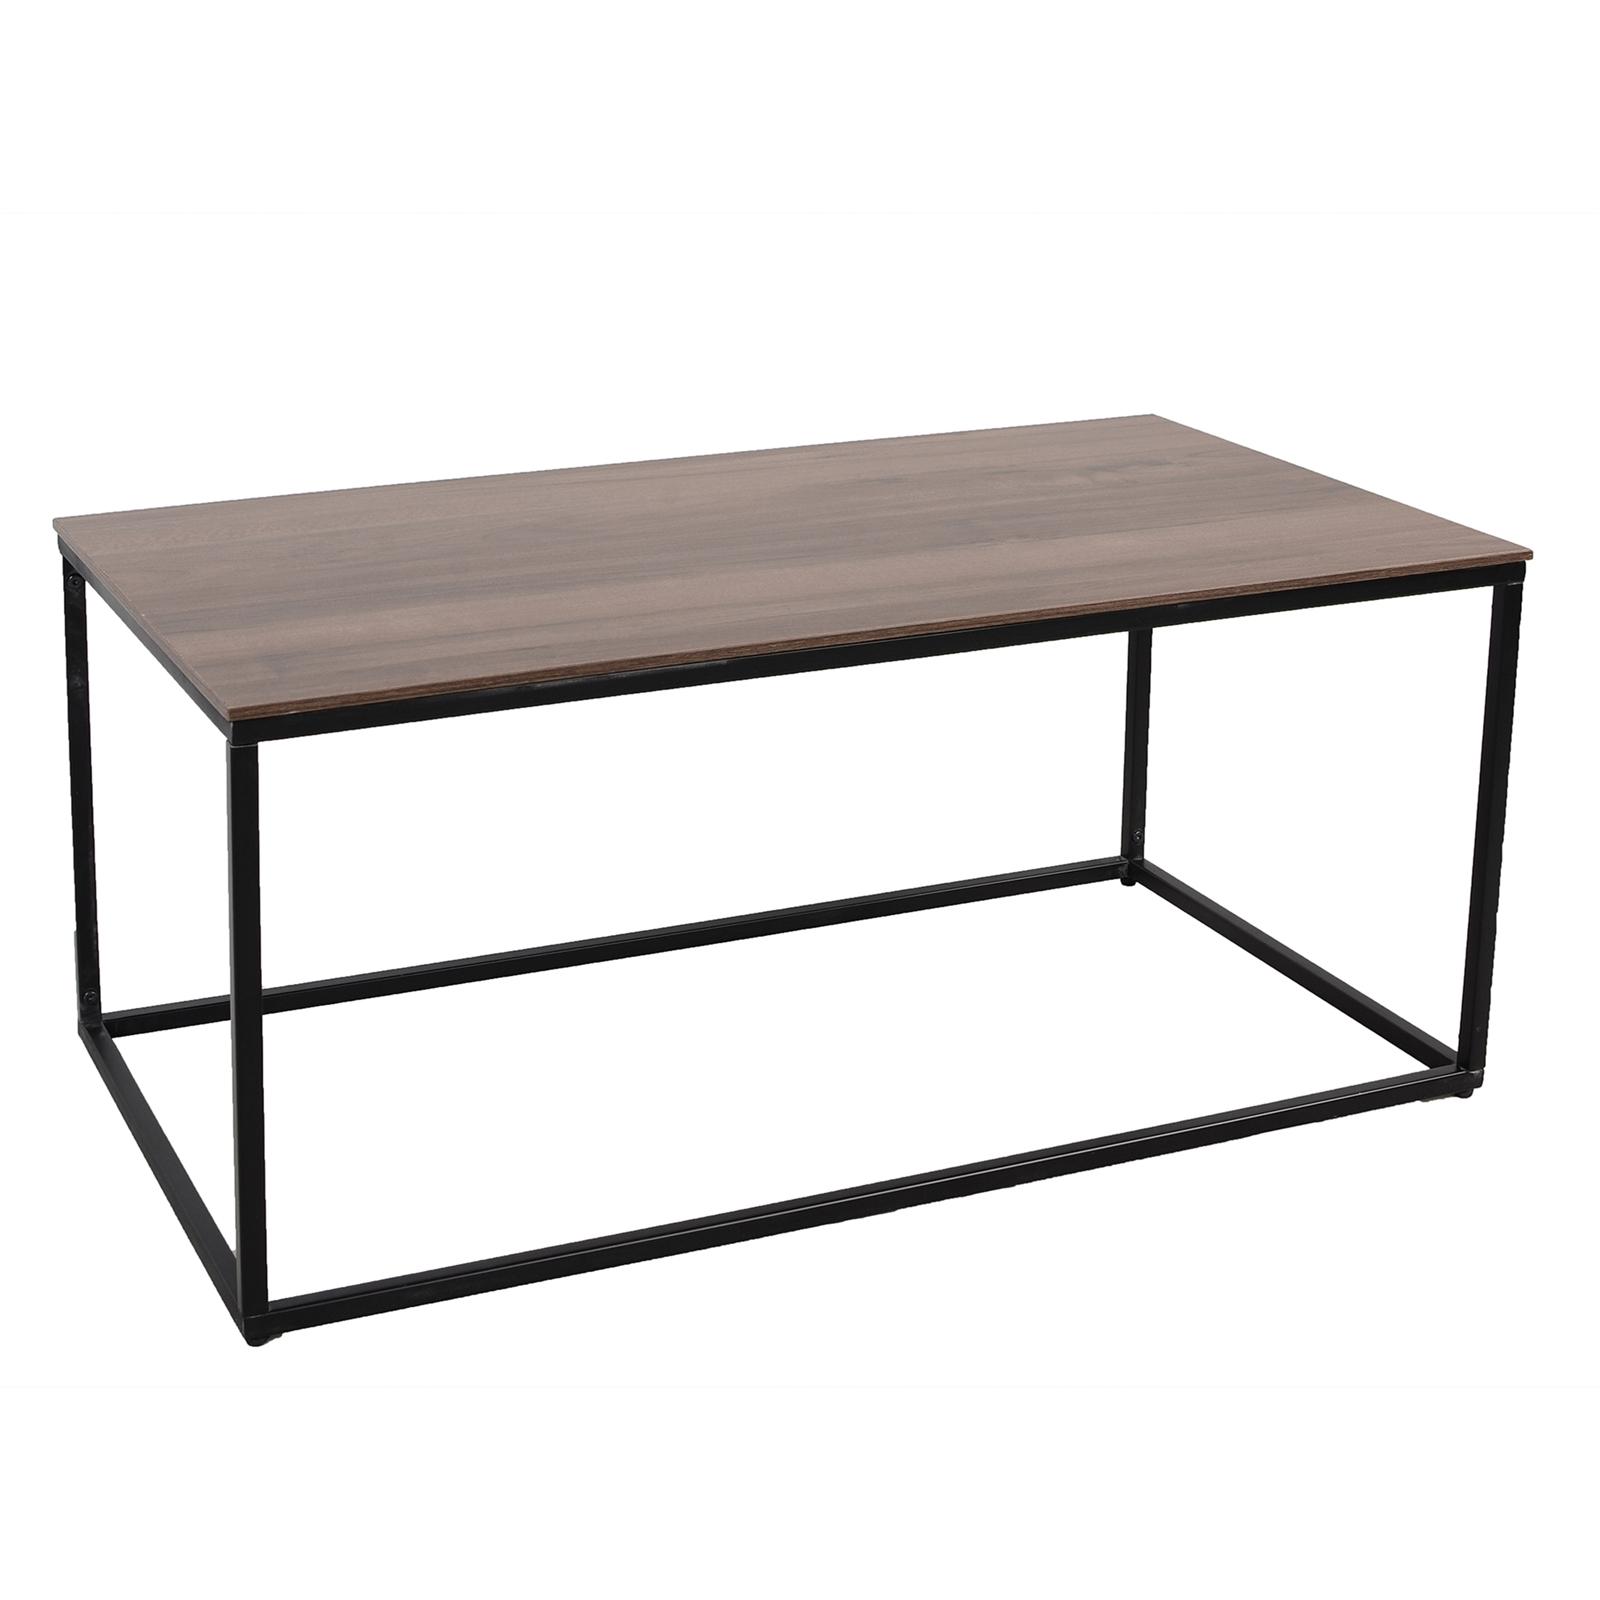 Walnut Top Coffee Table £17.50 / Side Table £10 @ HomeBase